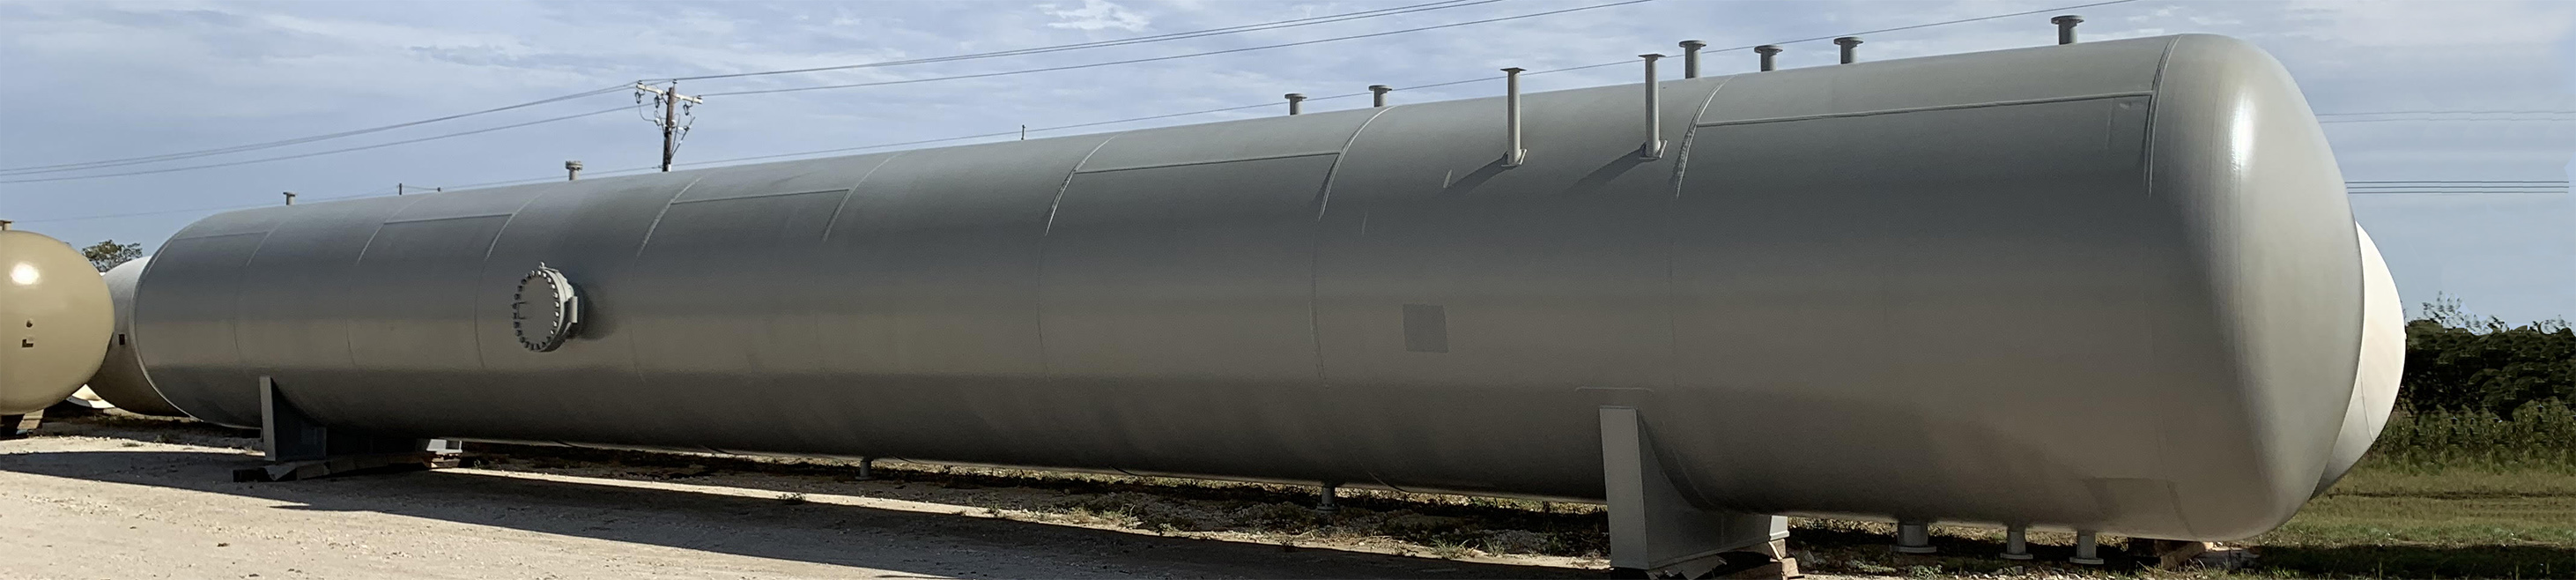 NGL ASME Storage Vessel Fabrication - Engineering Design